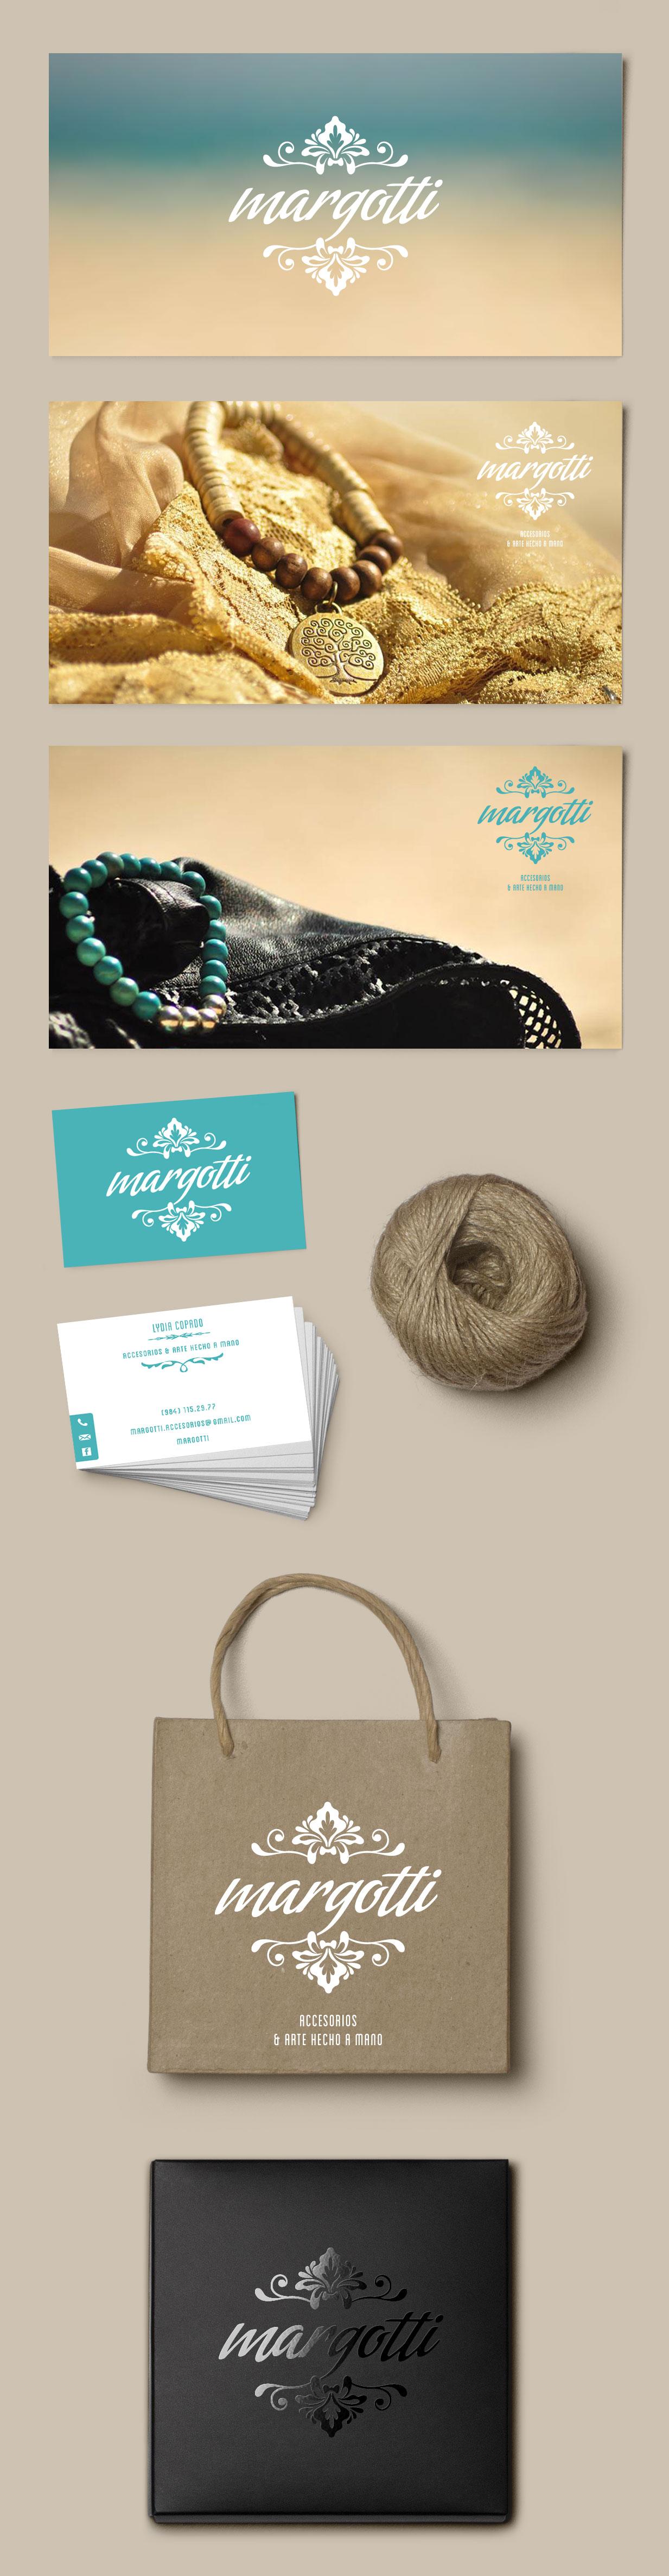 branding-margotti_stationary_jewerly